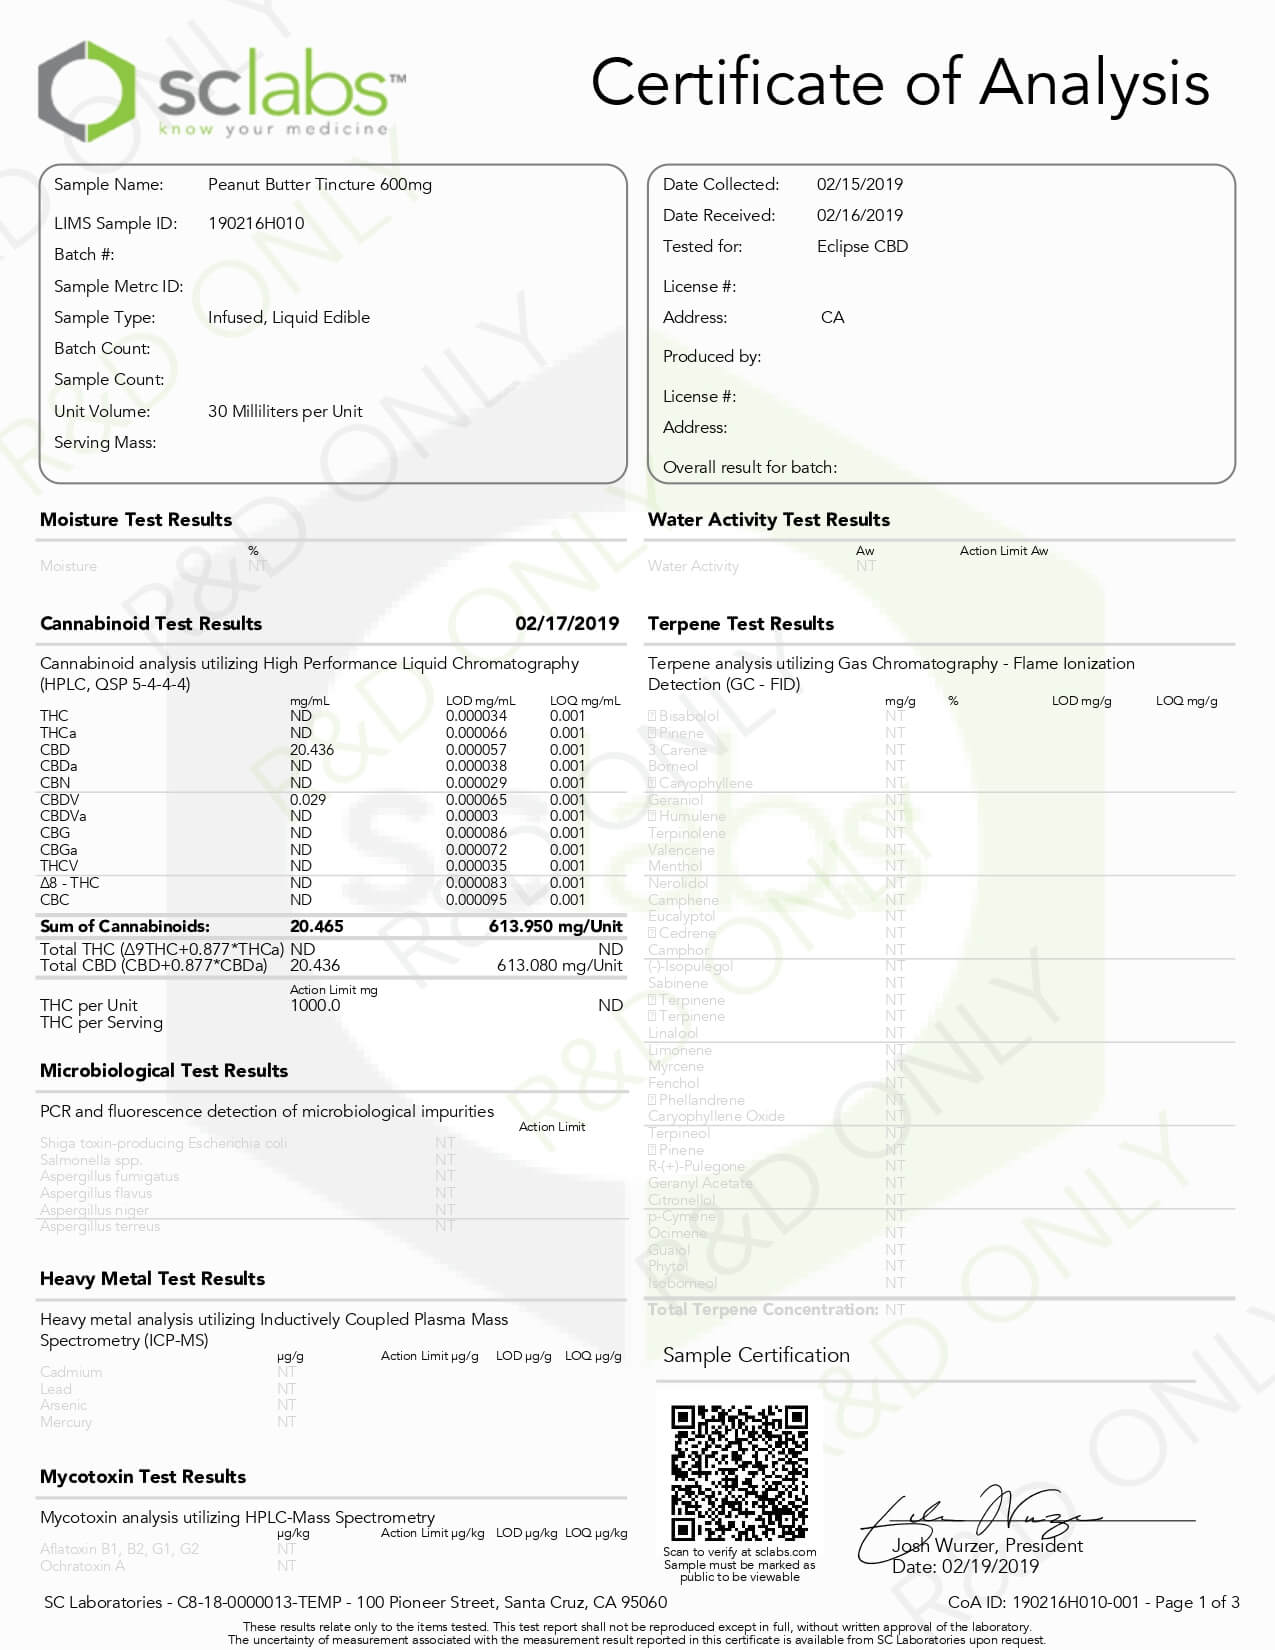 Eclipse CBD MCT Tincture Peanut Butter 600mg Lab Report